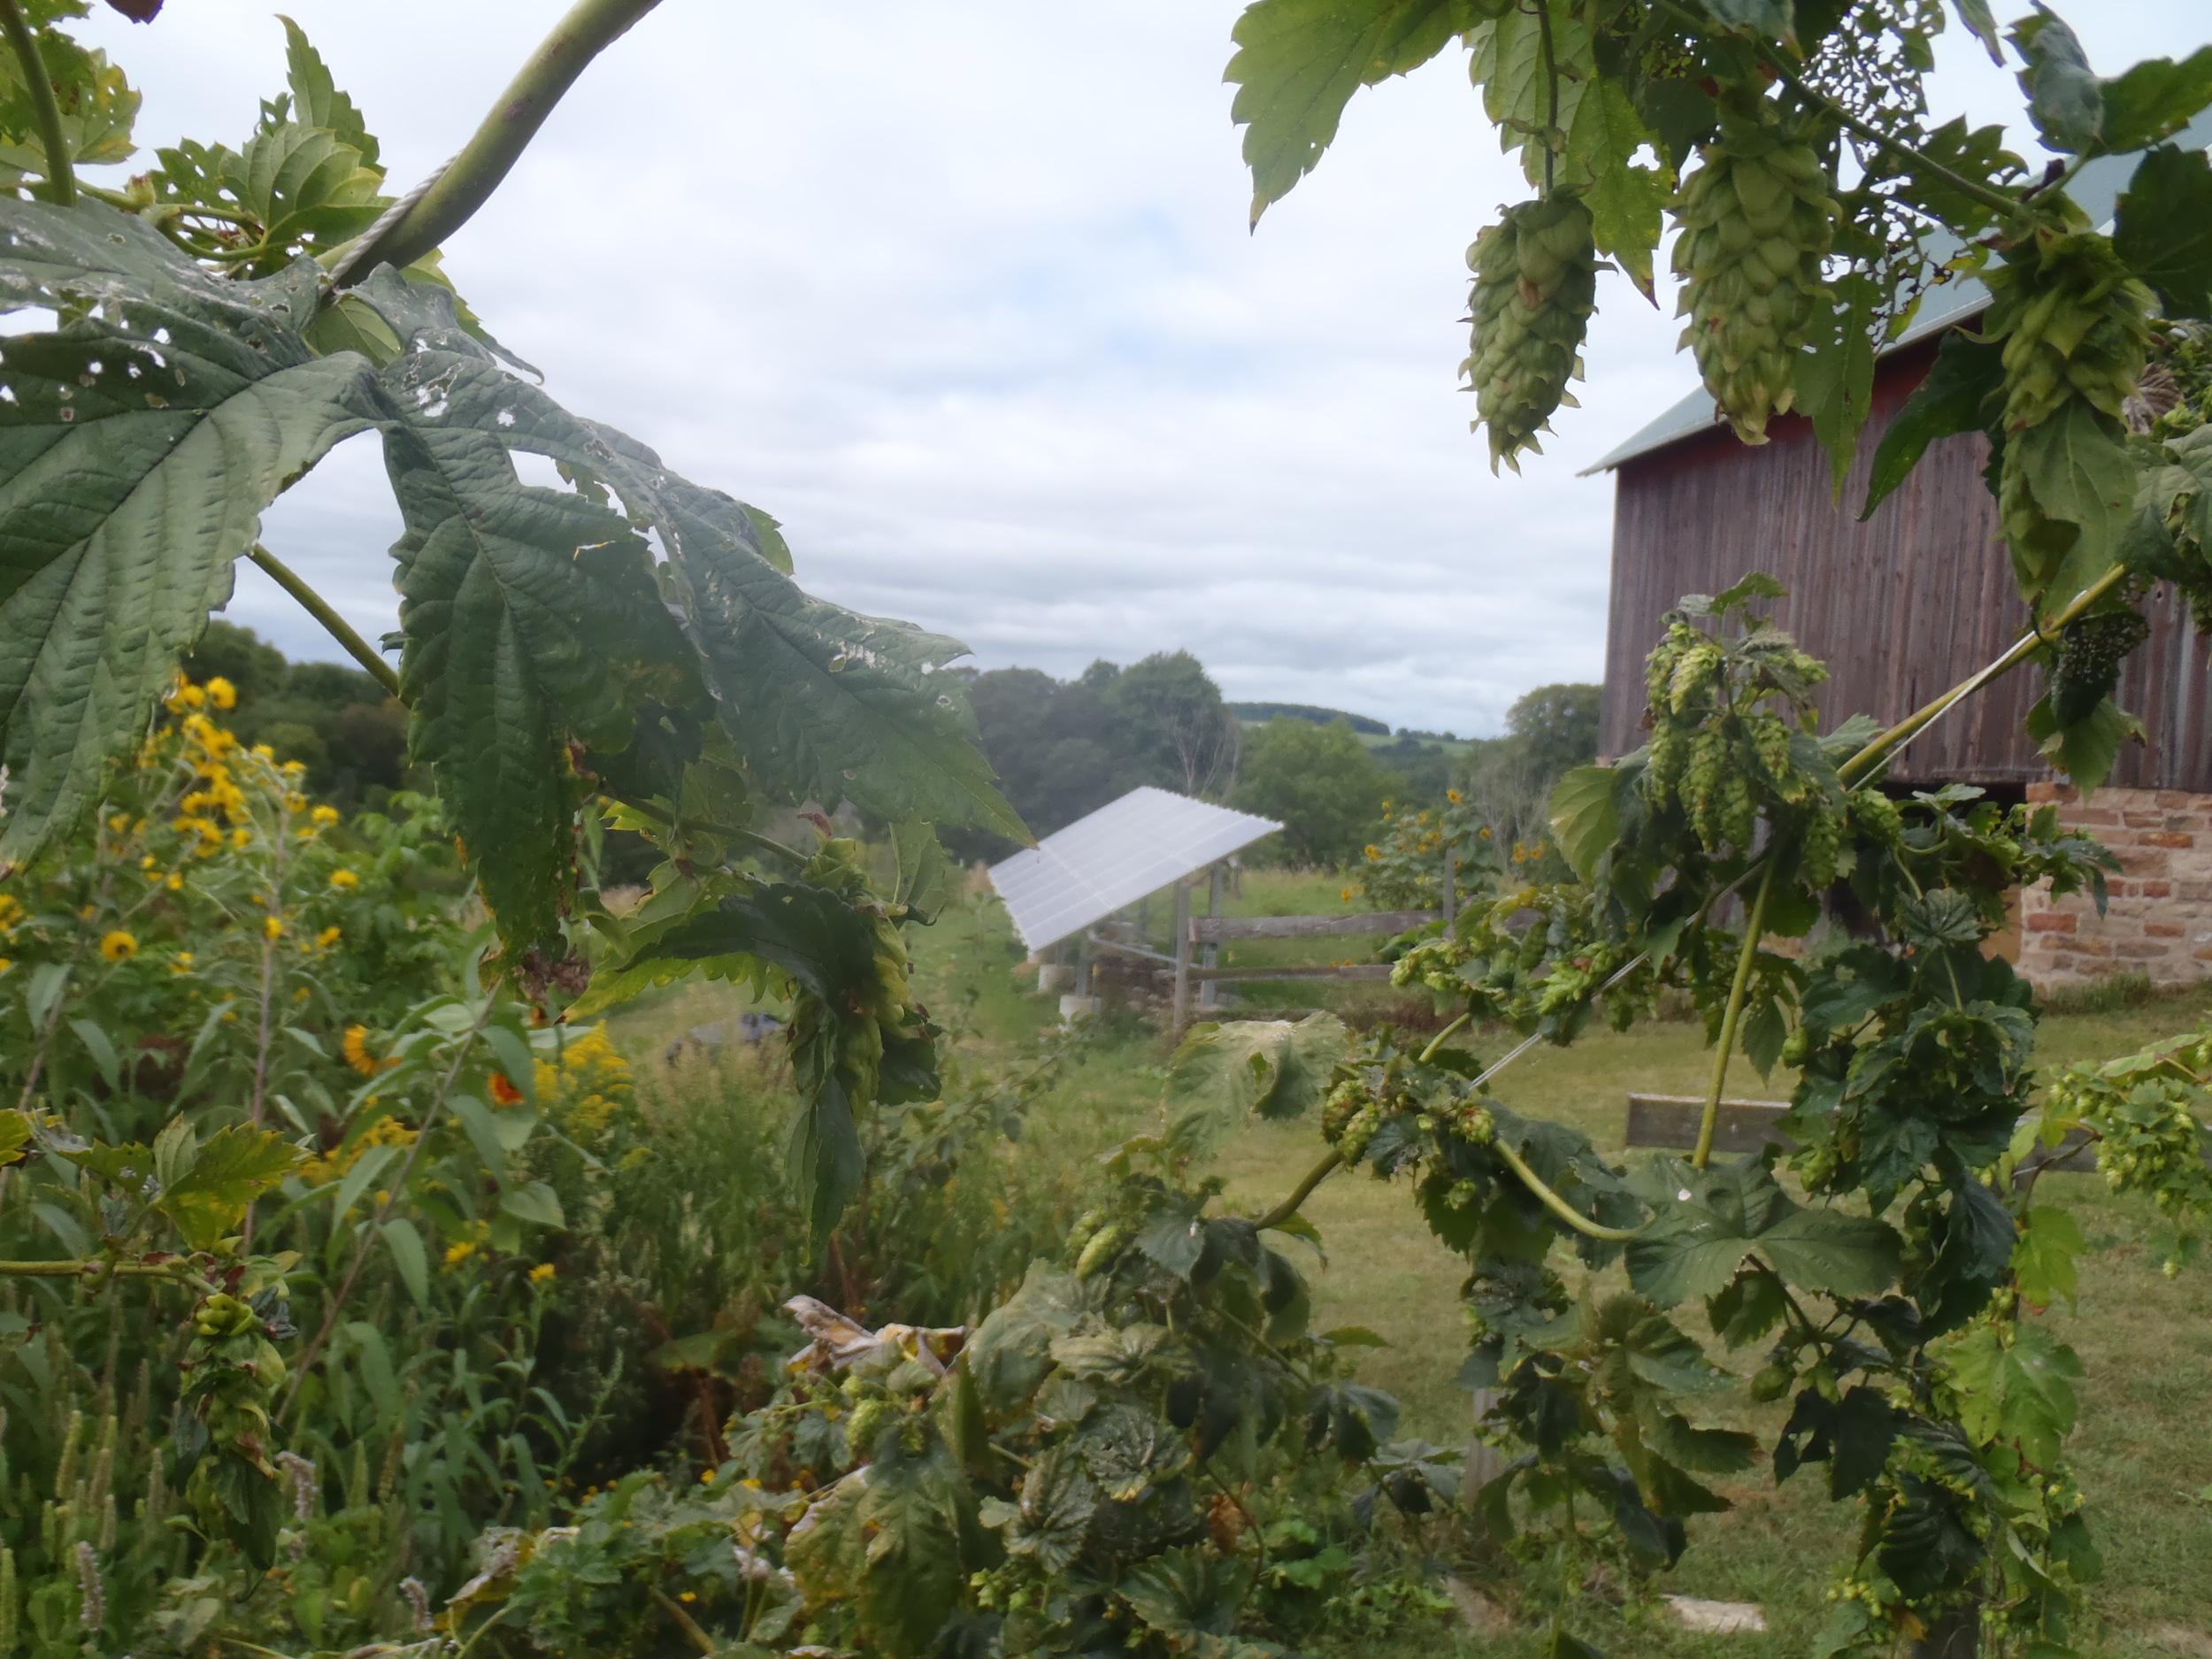 hop vines and solar panels